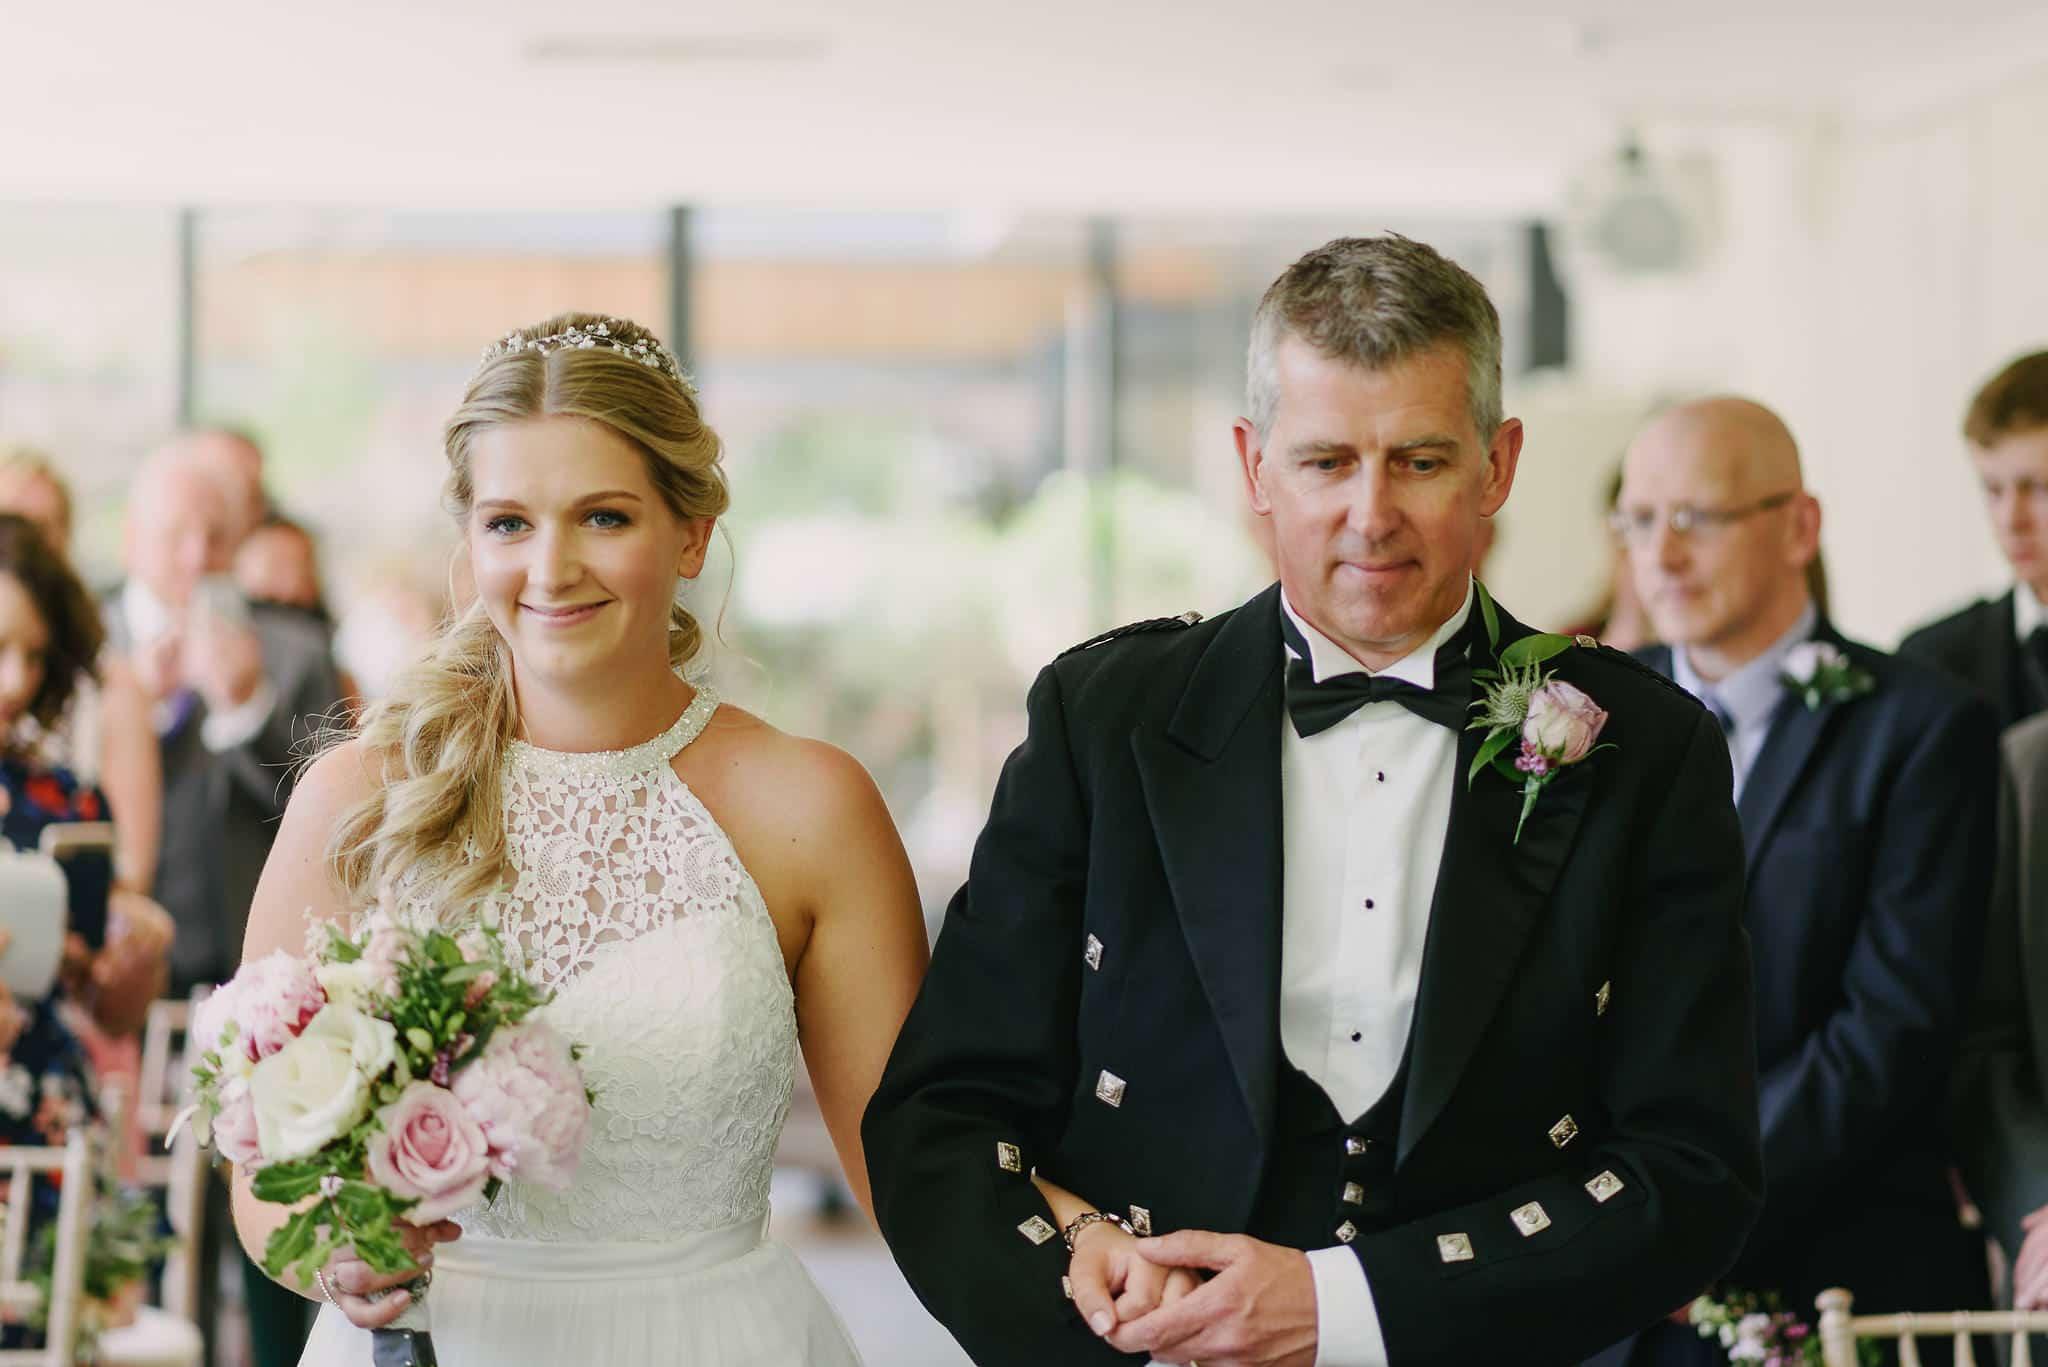 Bex & Neil - Norfolk Mead Wedding 12